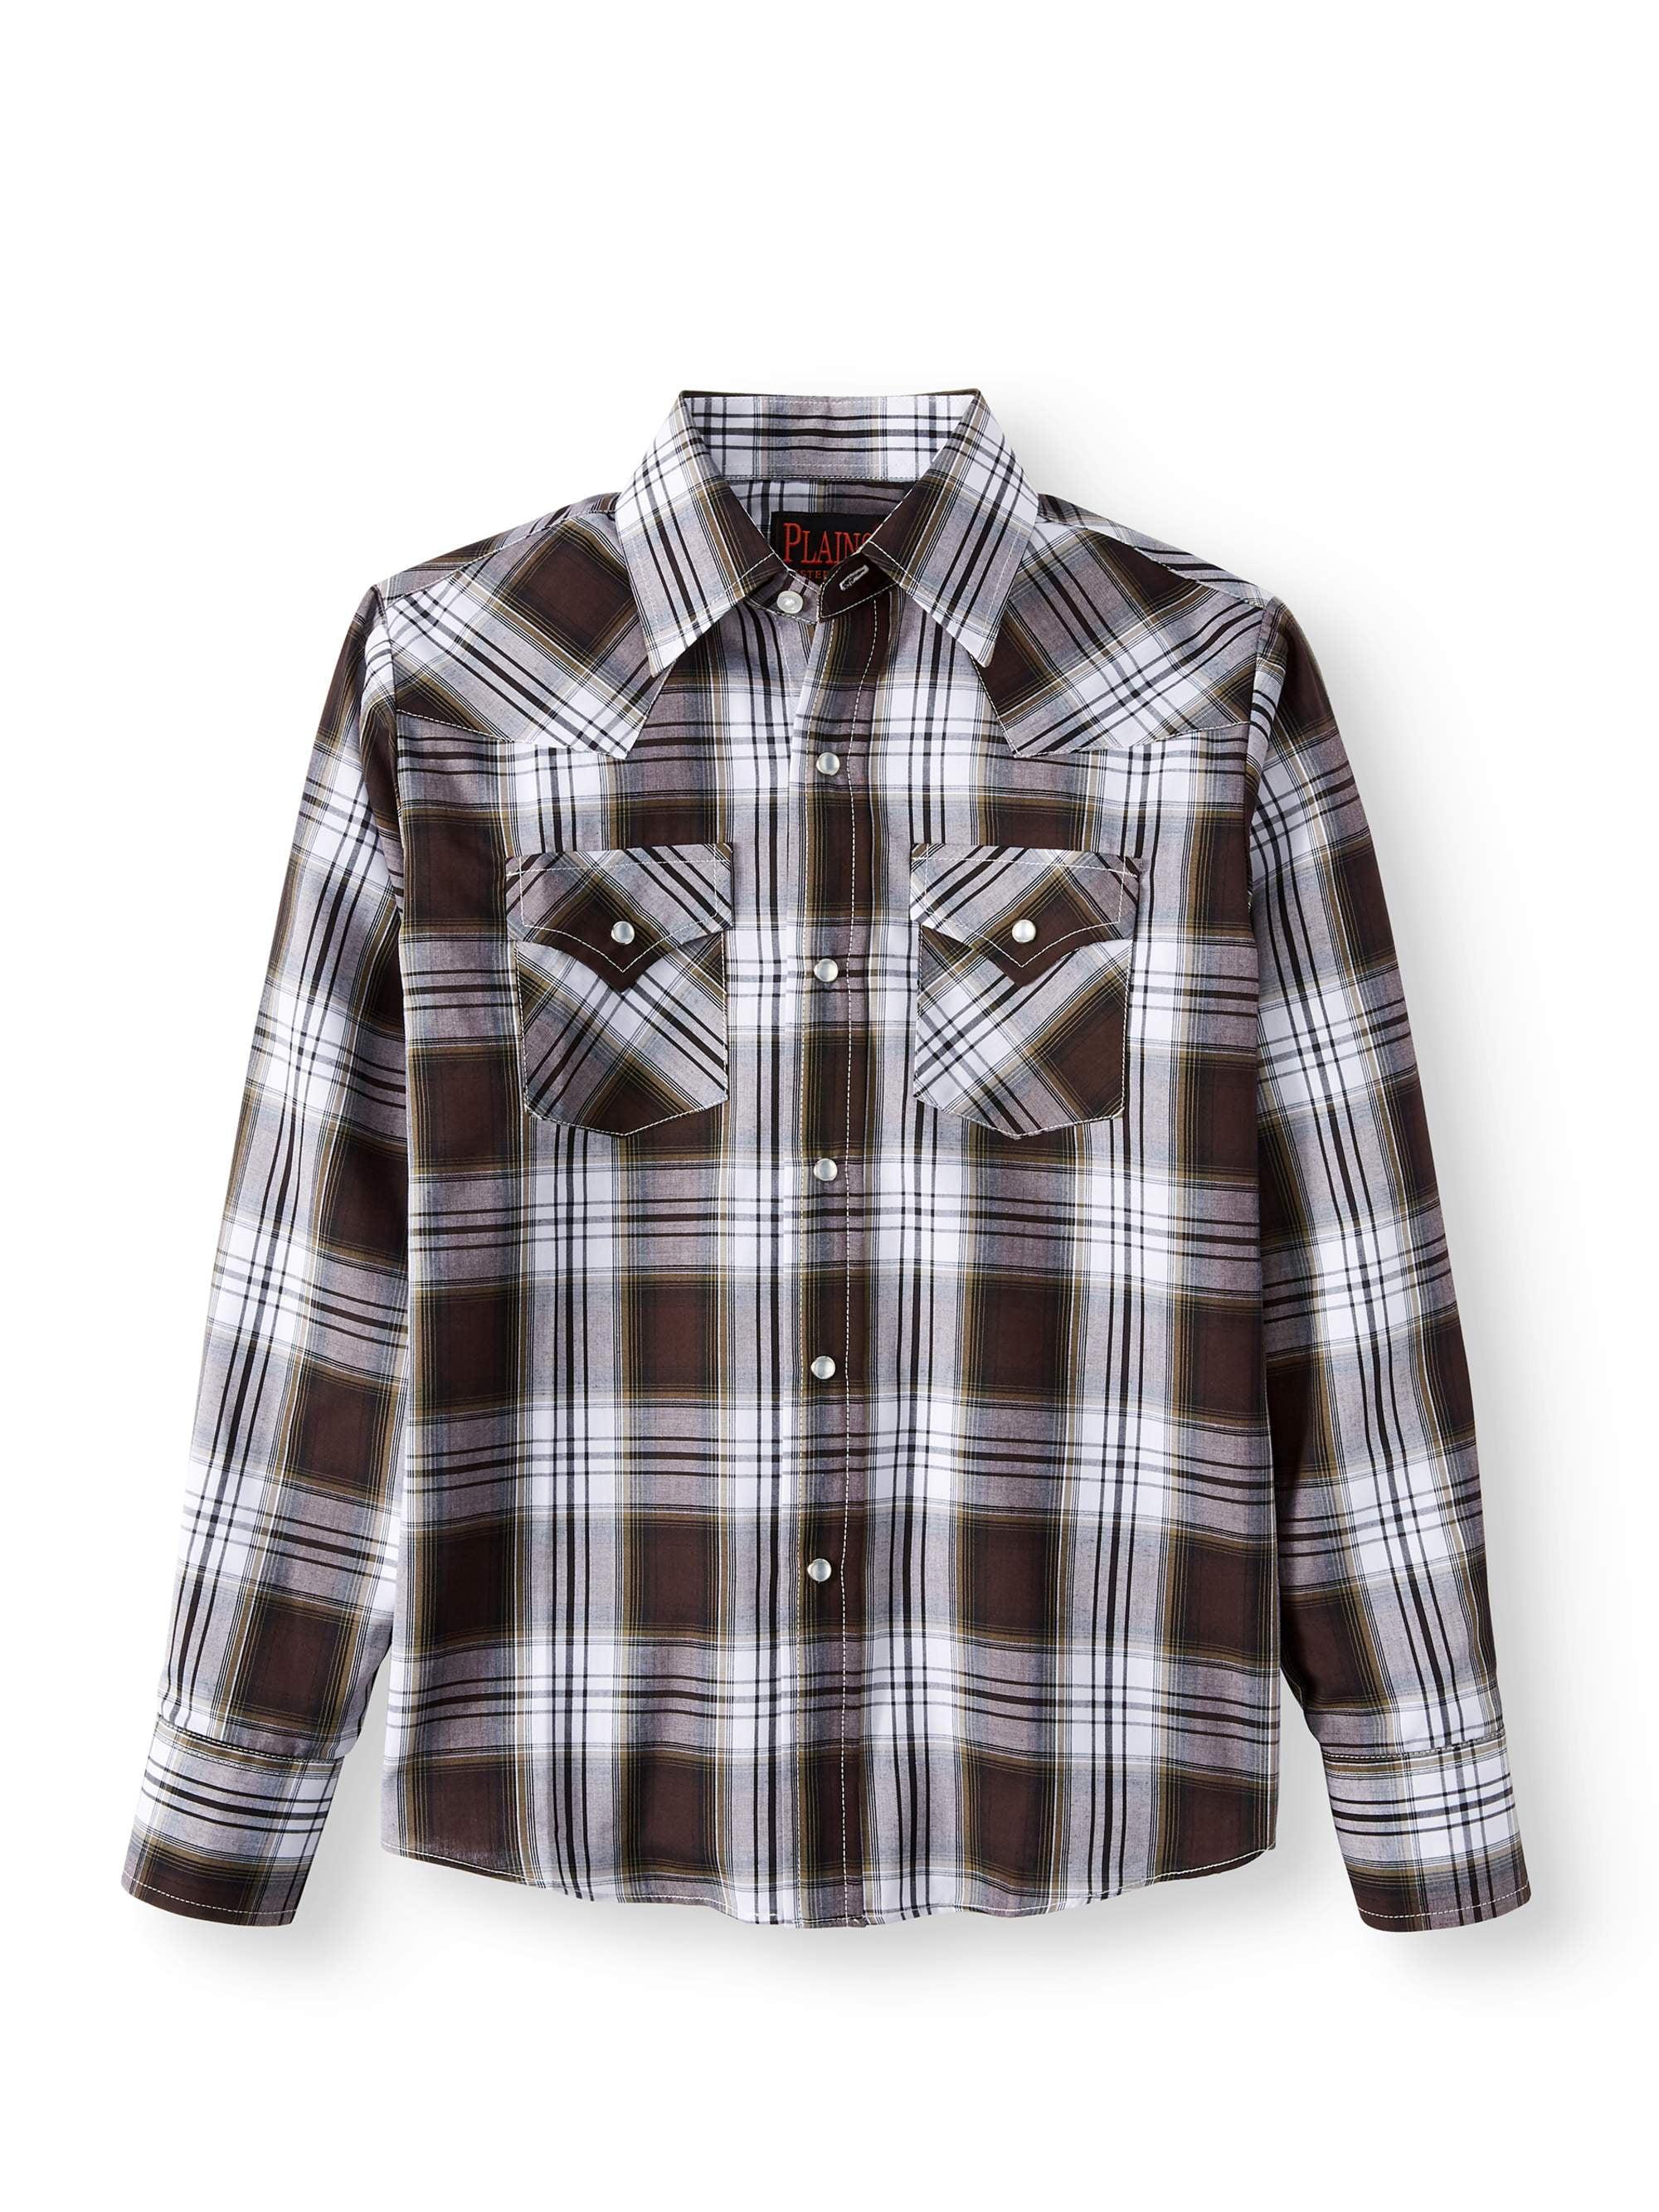 Plains Long Sleeve Western Plaid Button Up Shirt (Little Boys & Big Boys)